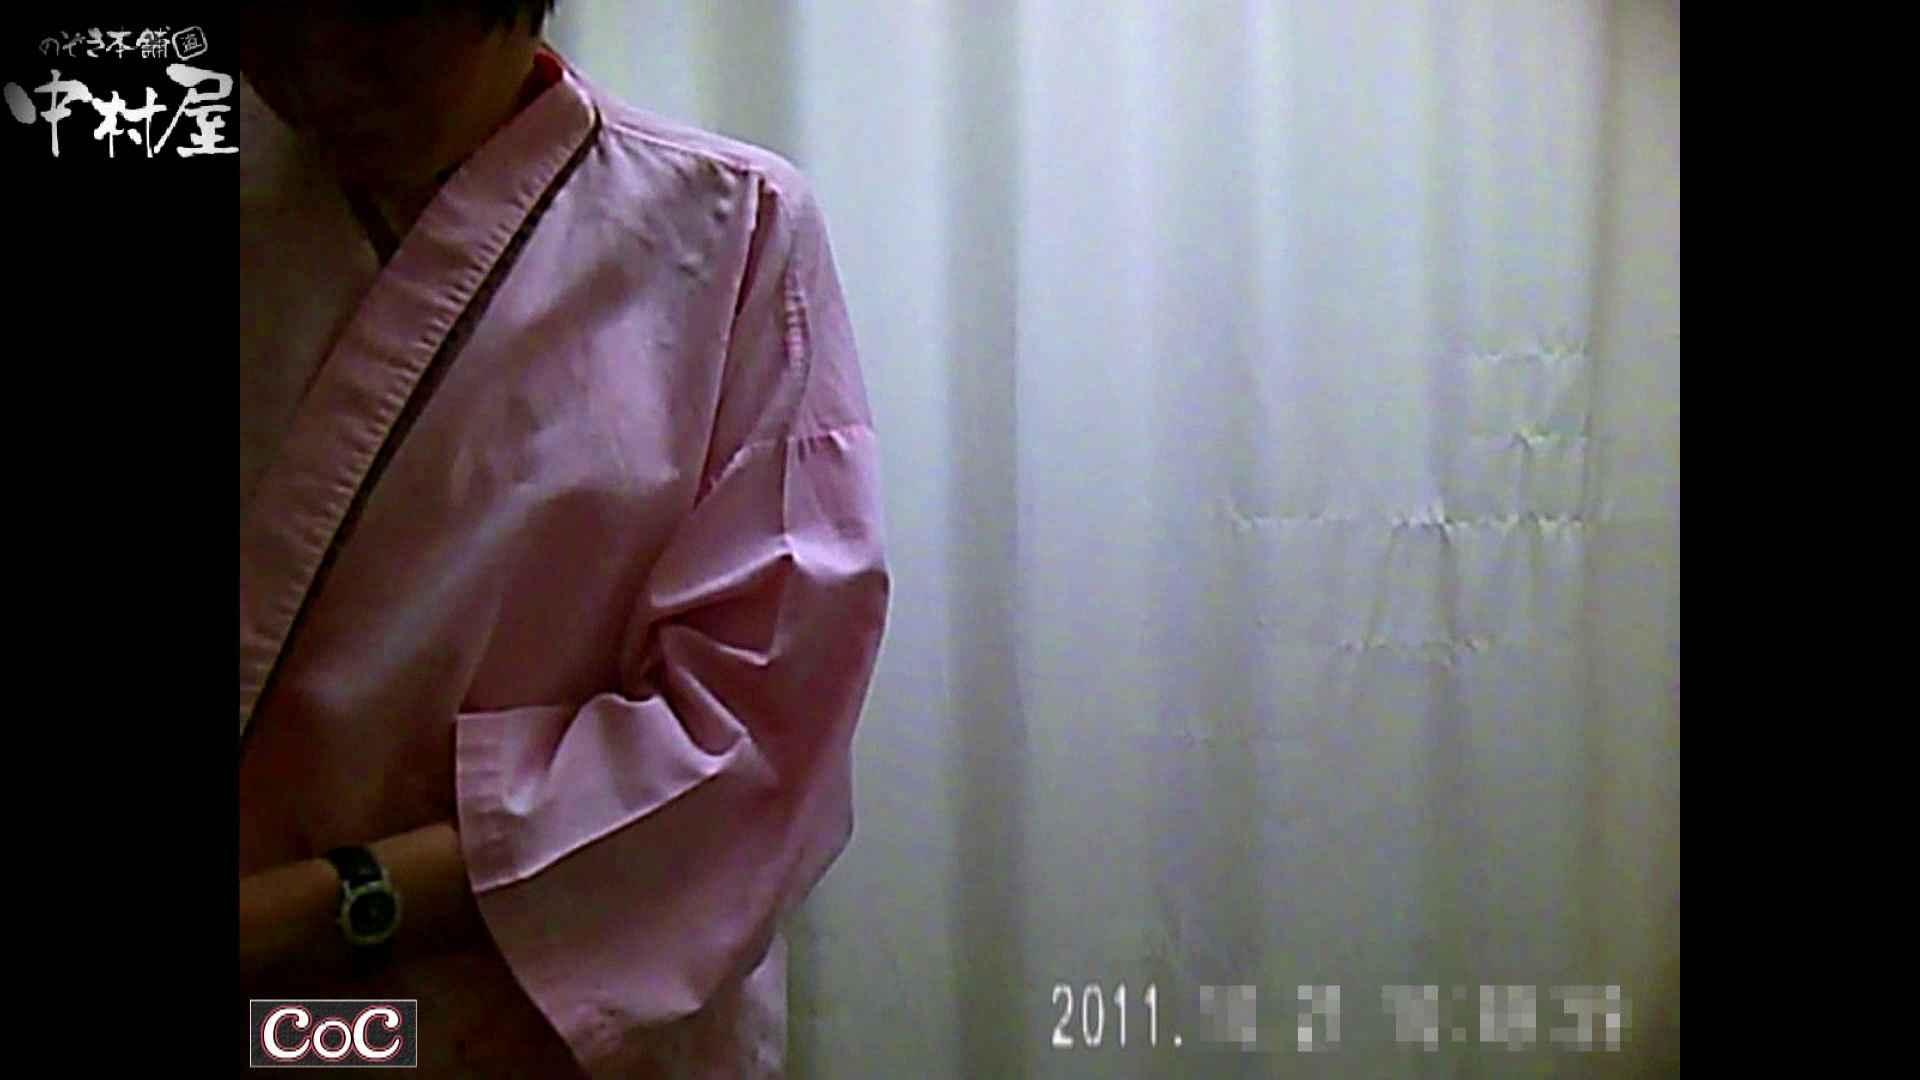 Doctor-X元医者による反抗vol.66後編 盗撮シリーズ | おまんこ見放題  96PIX 87